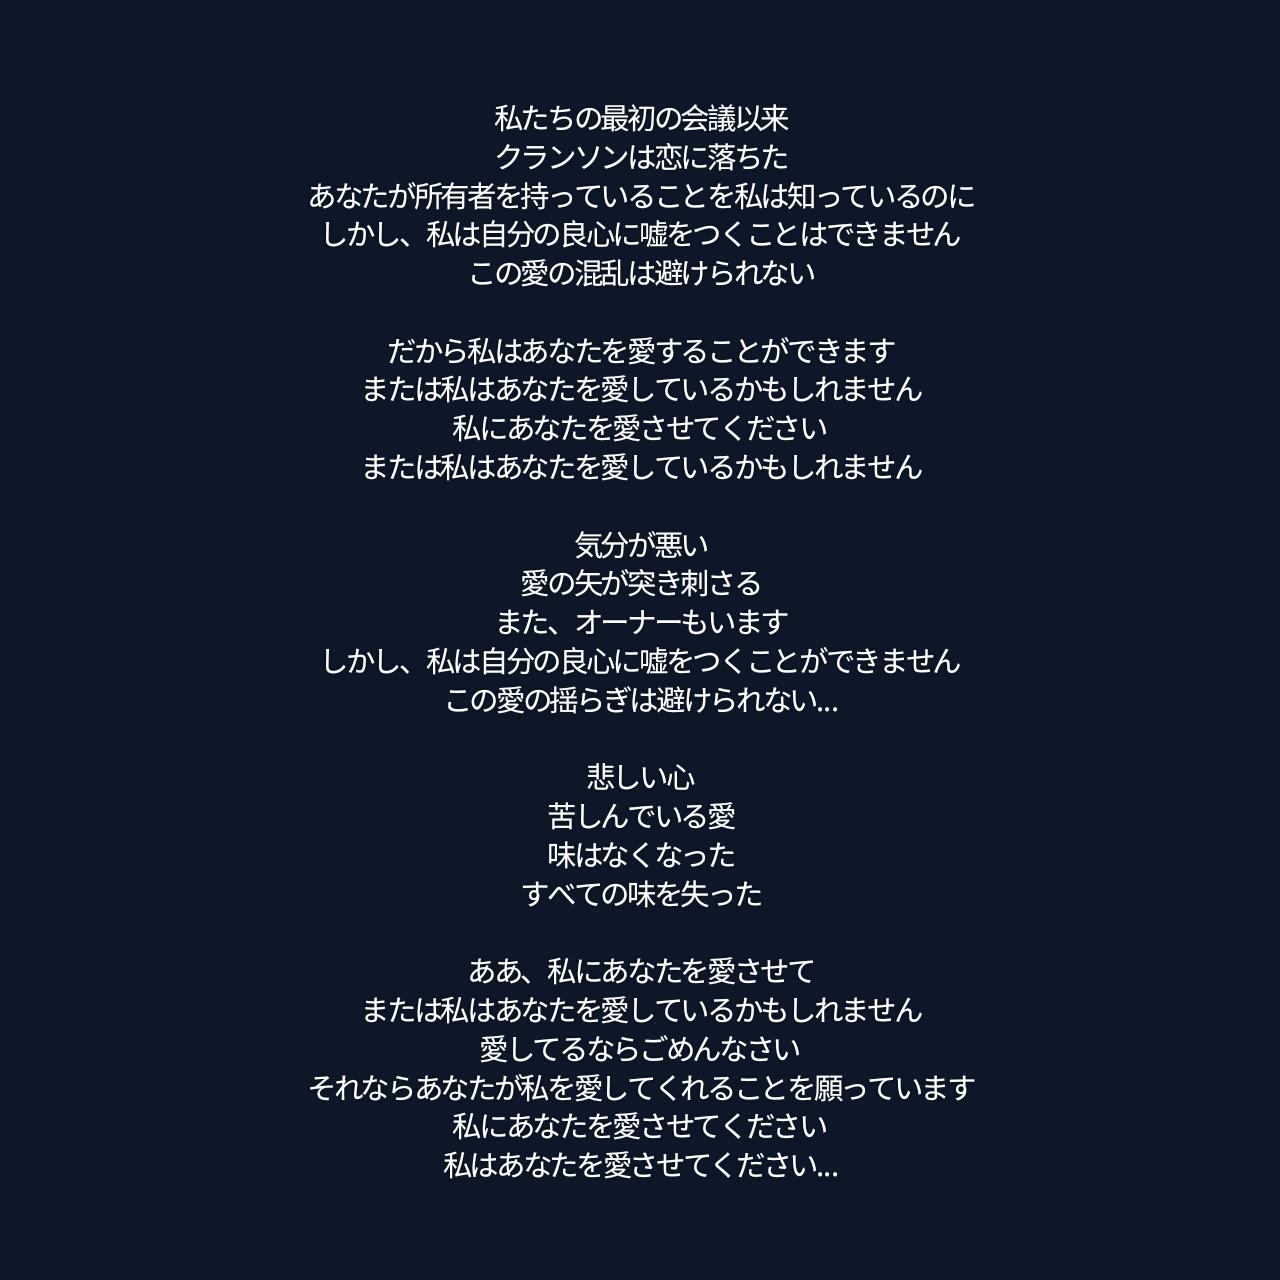 Lirik Lagu Noah Kala Cinta Menggoda Versi Bahasa Jepang dan Terjemahannya